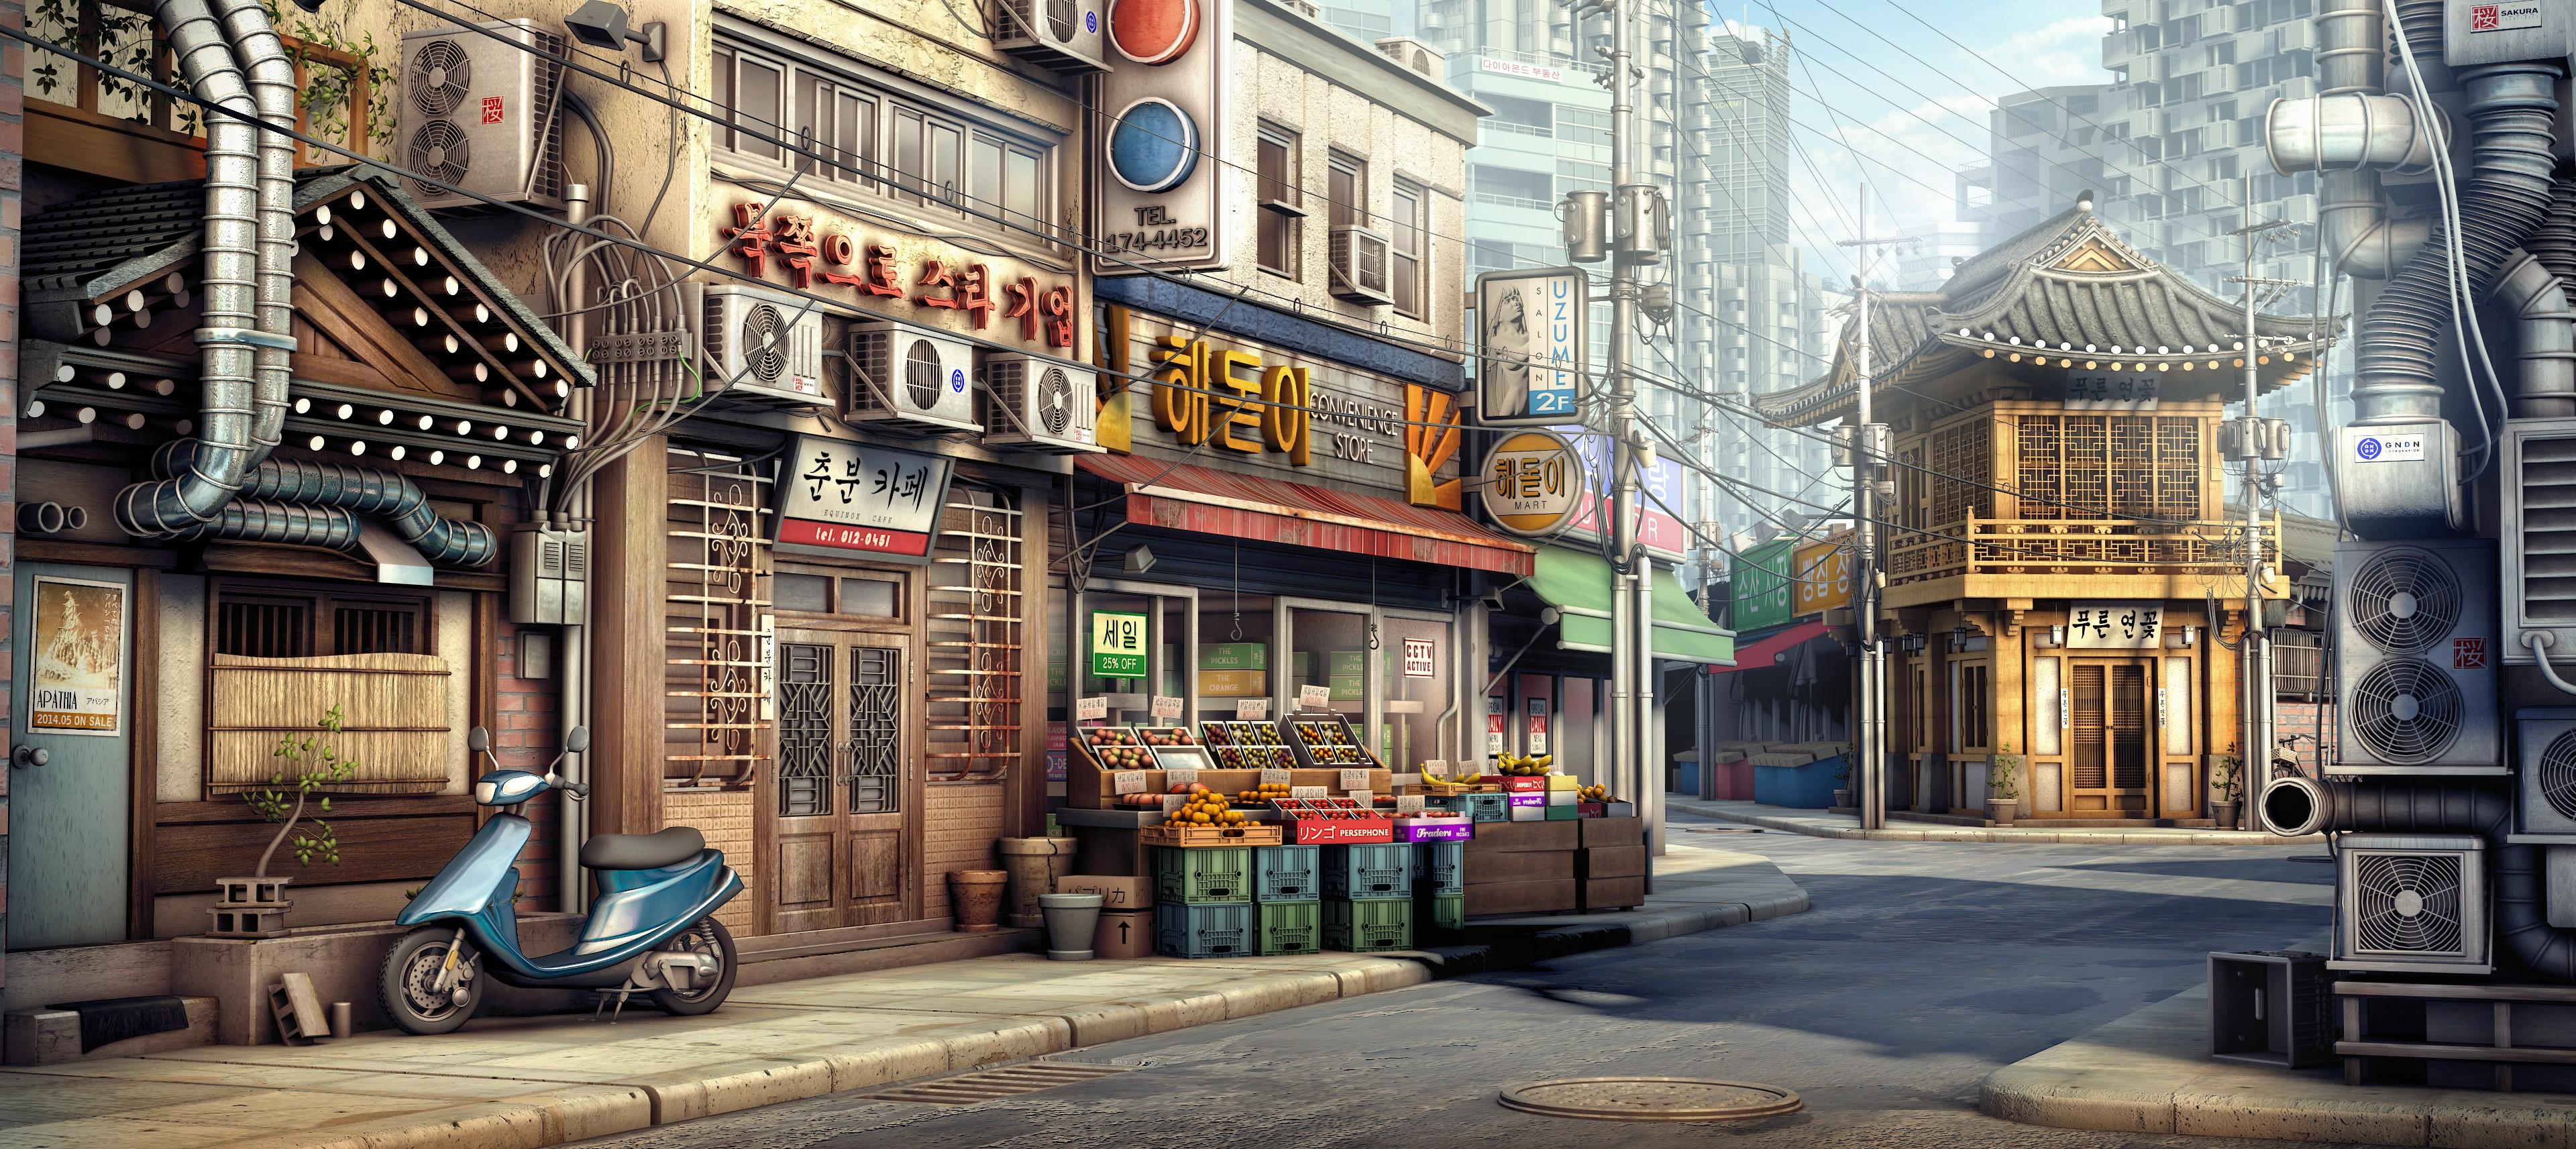 Wallpaper : City, Street, Cityscape, Road, Town, Korean